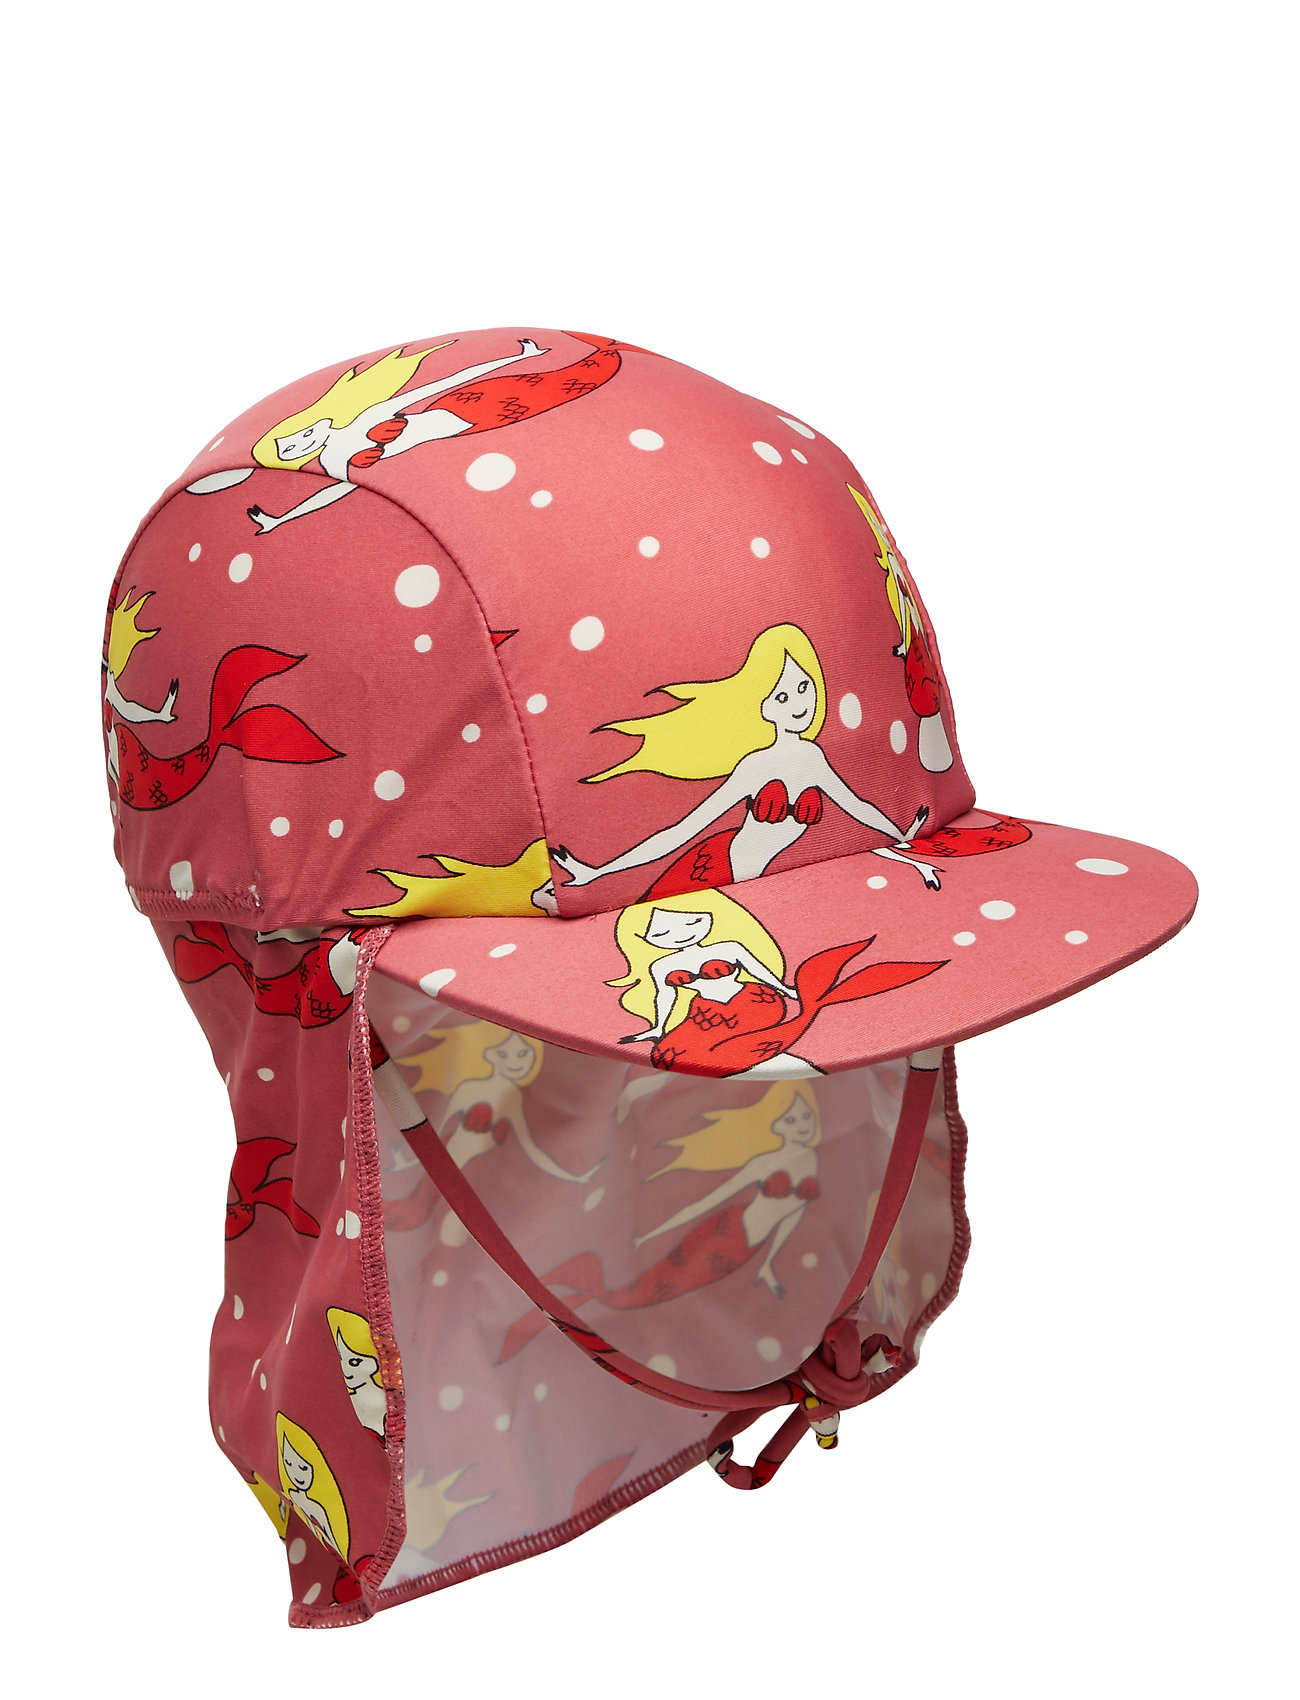 Småfolk Swimwear, Sun cap. Mermaid - RAPTURE ROSE